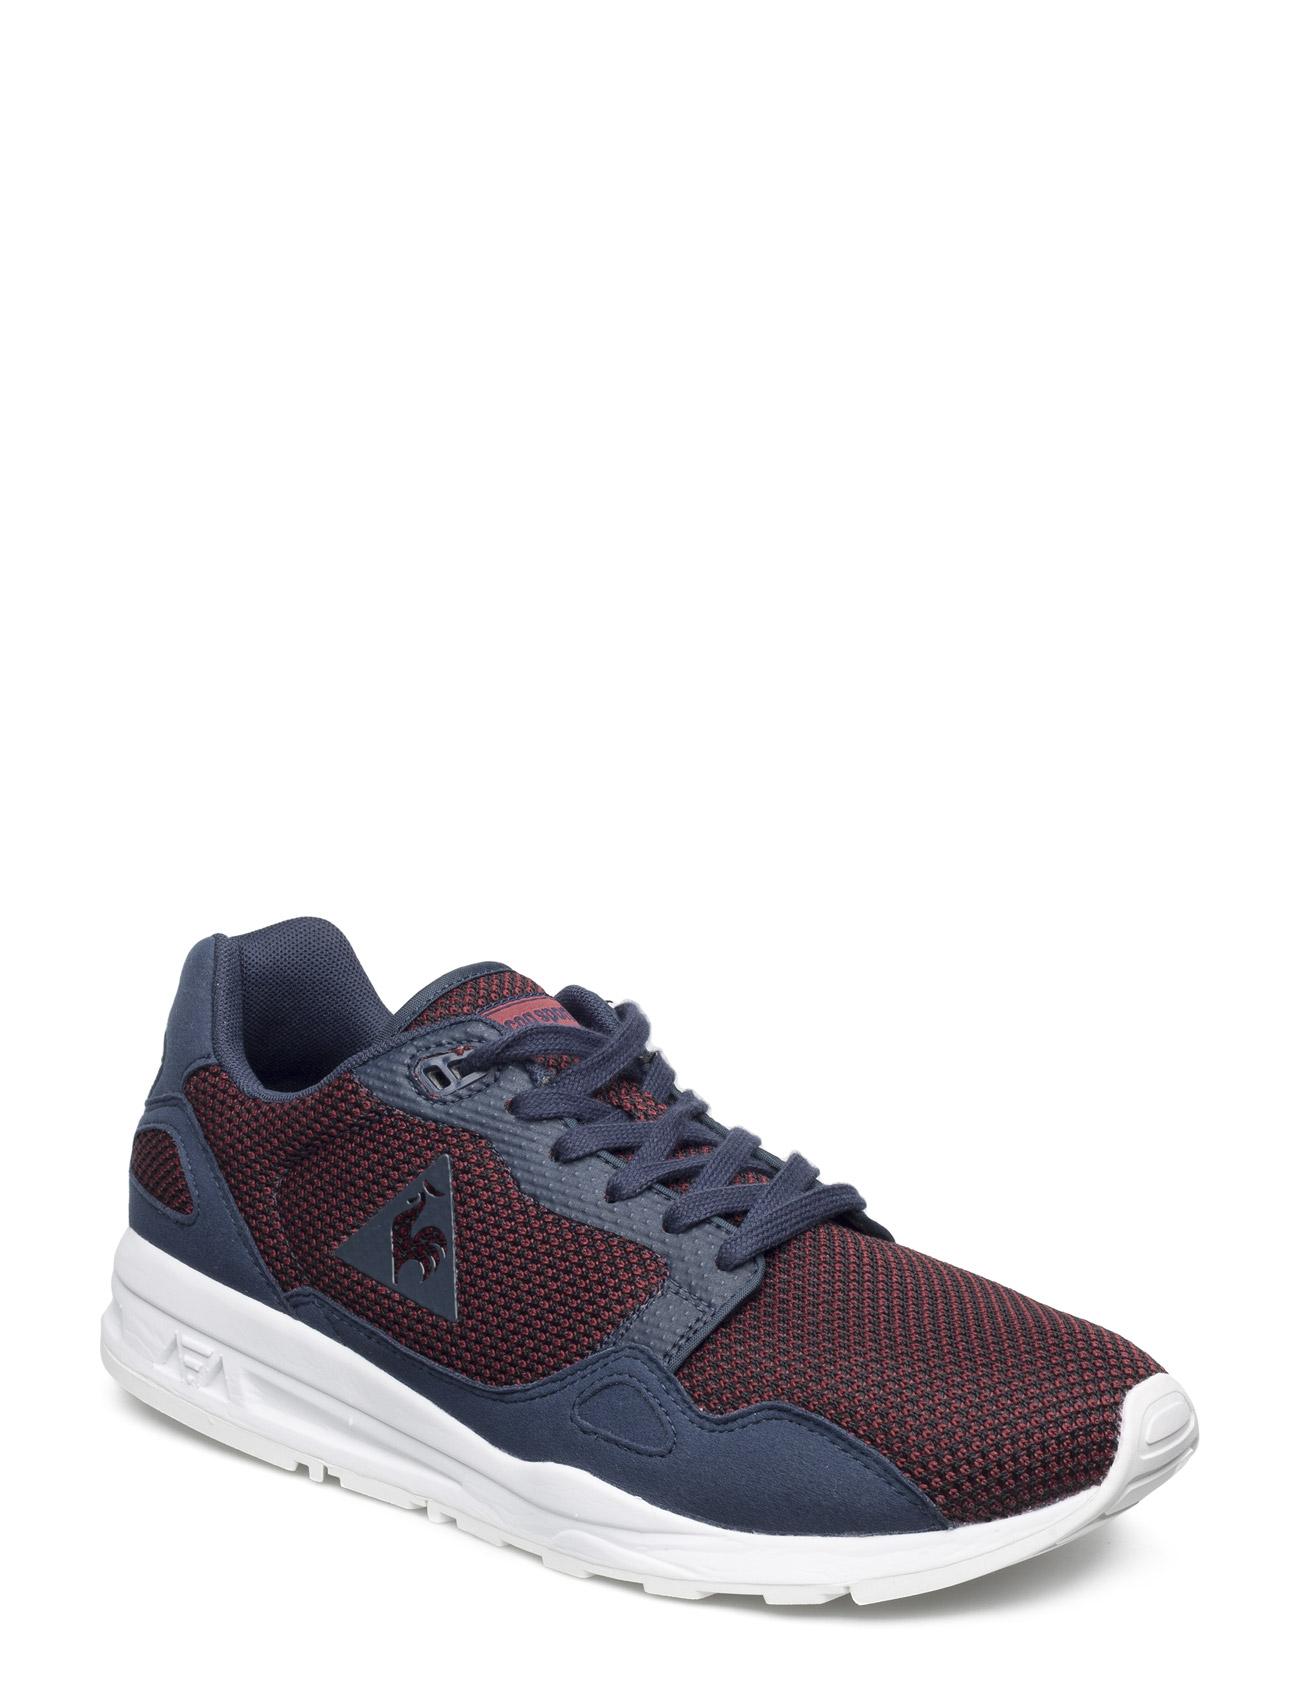 Lcs R900 Mesh 2 Tones Le Coq Sportif Sneakers til Mænd i Dress Blues